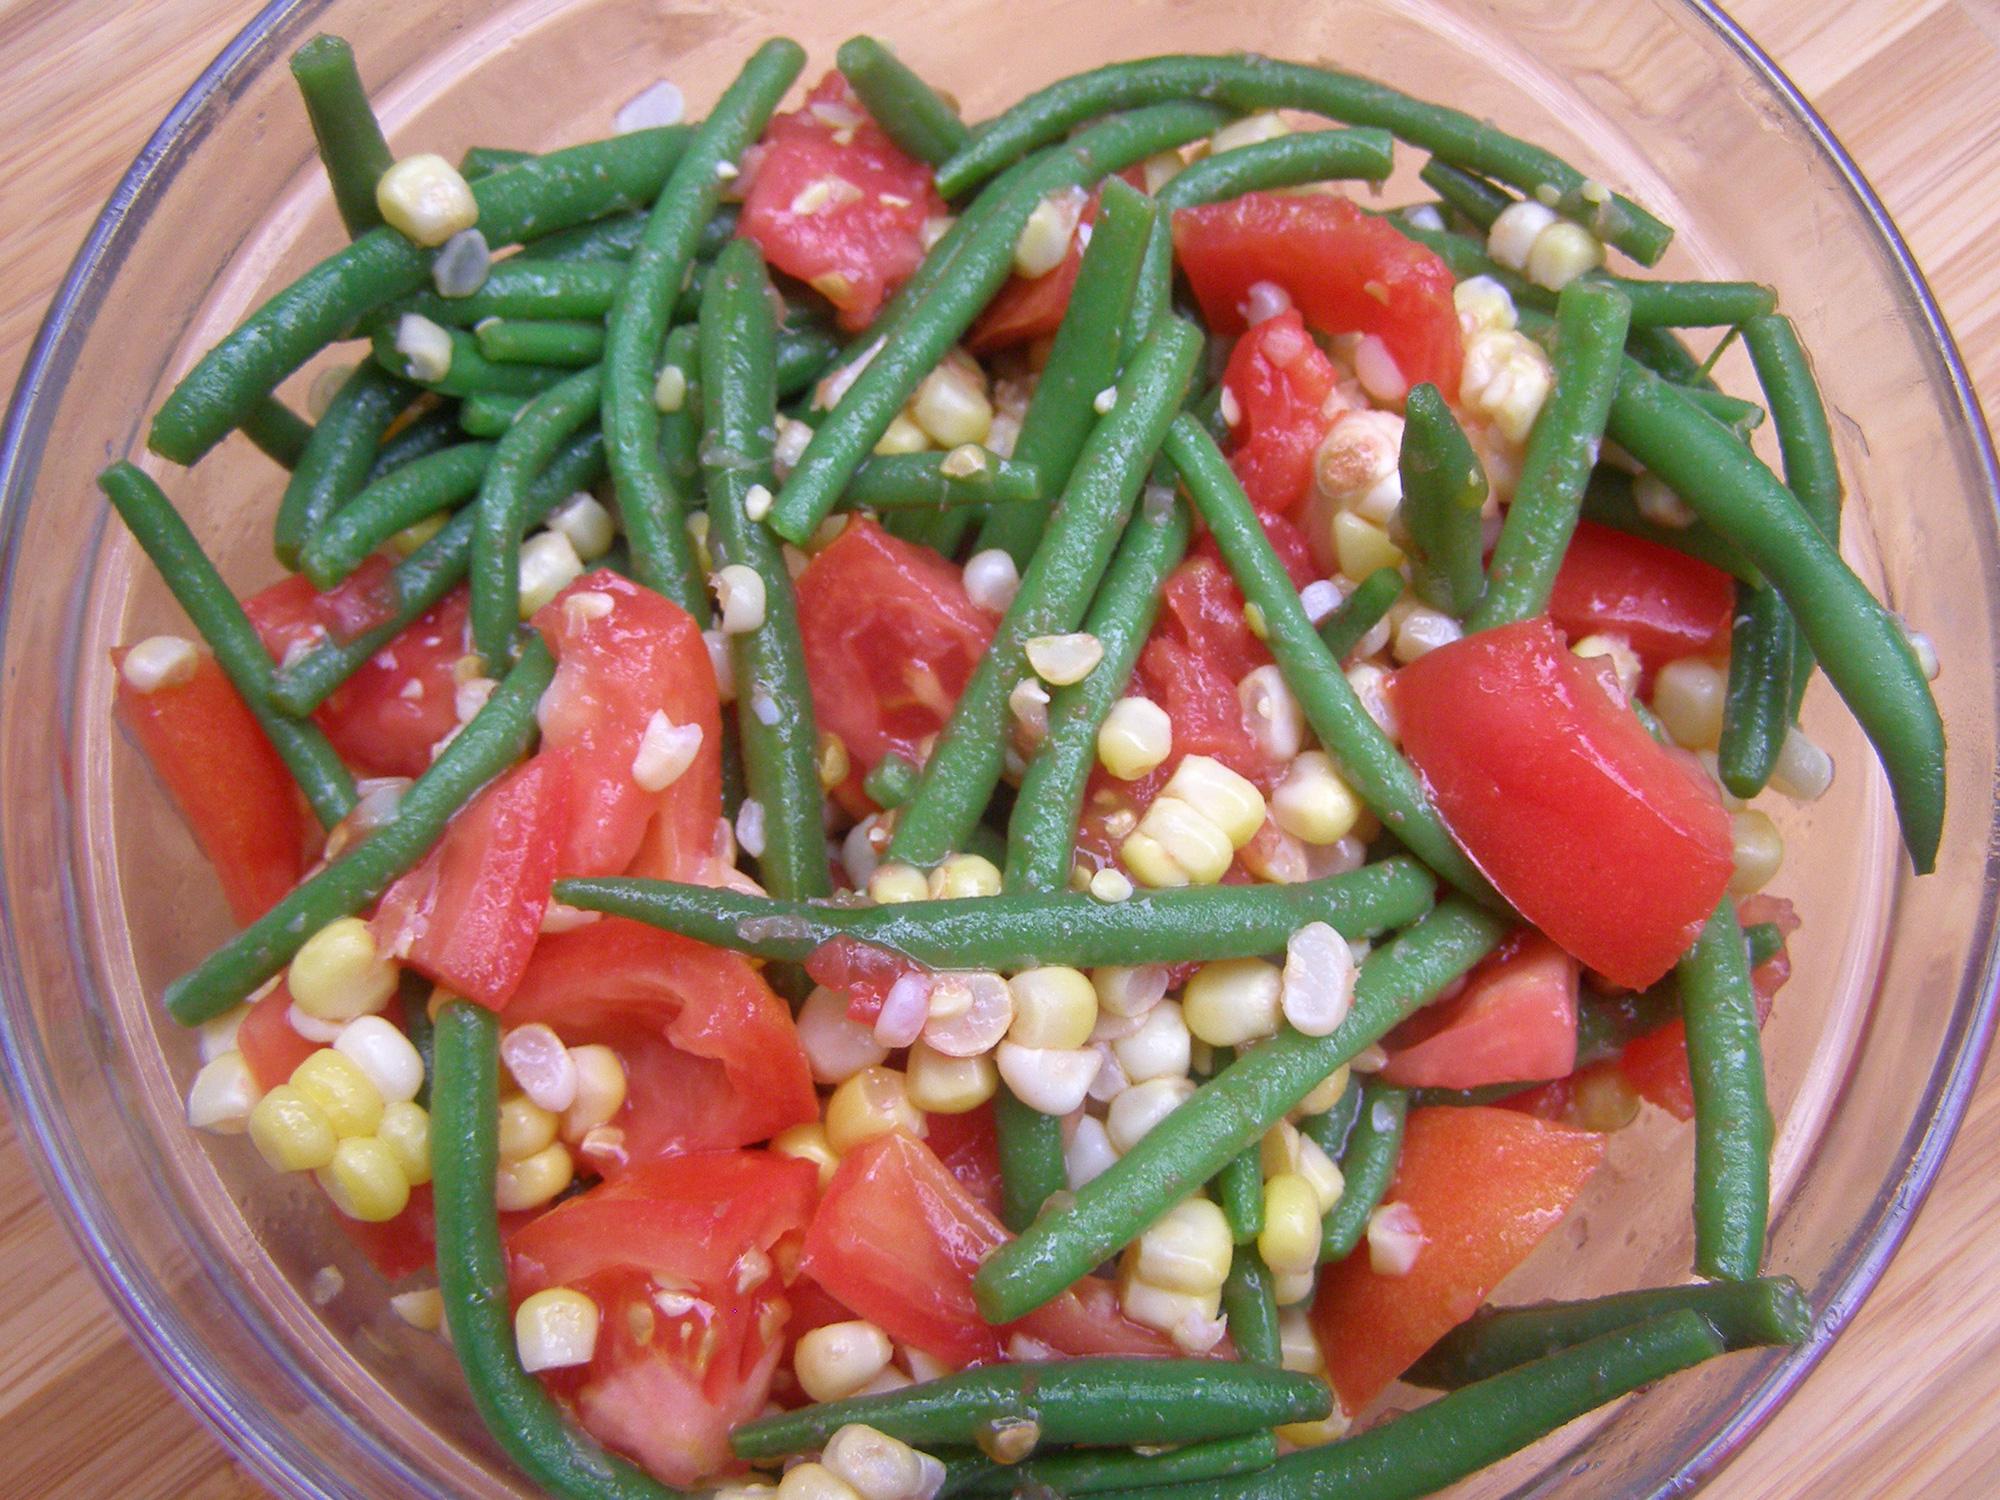 Tomato, Corn and Green Bean Salad